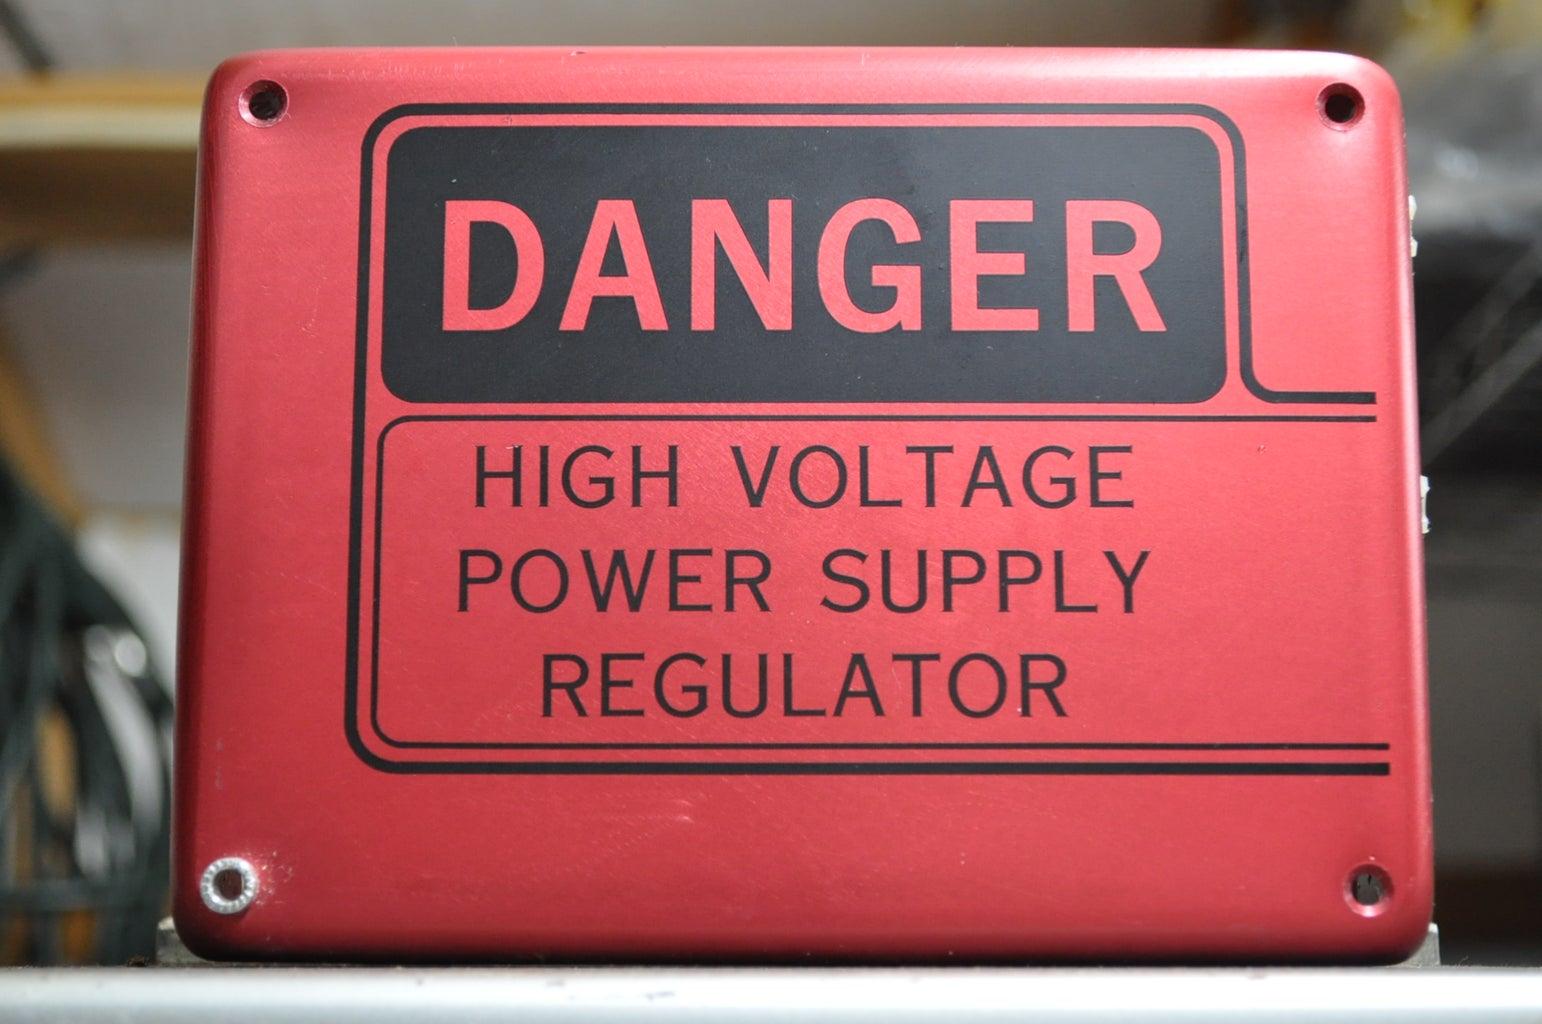 Tools, Supplies, Warnings, and DANGER